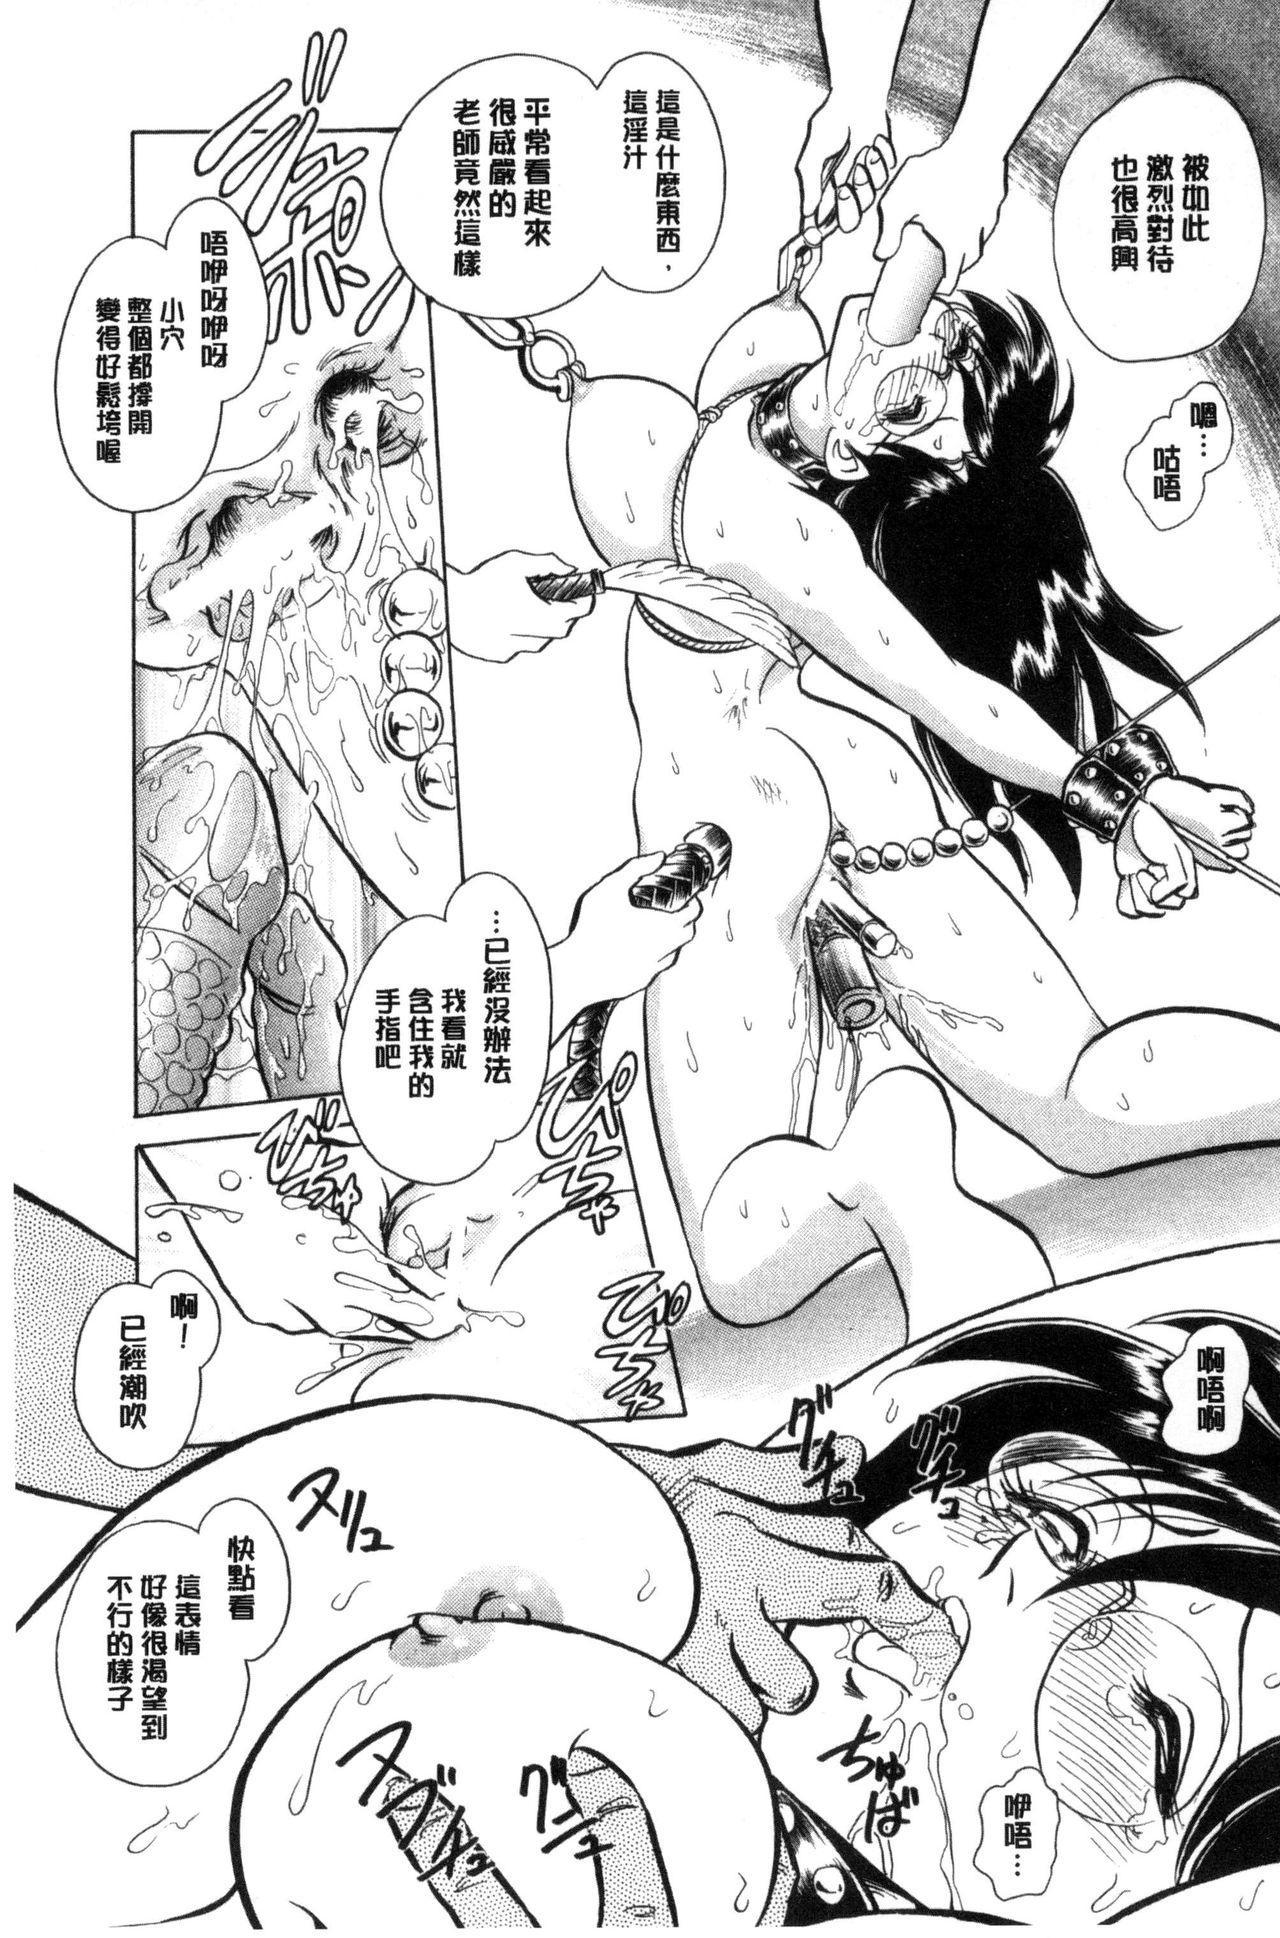 Hazukashii Kagai Jugyou | 害羞的課外授業 93